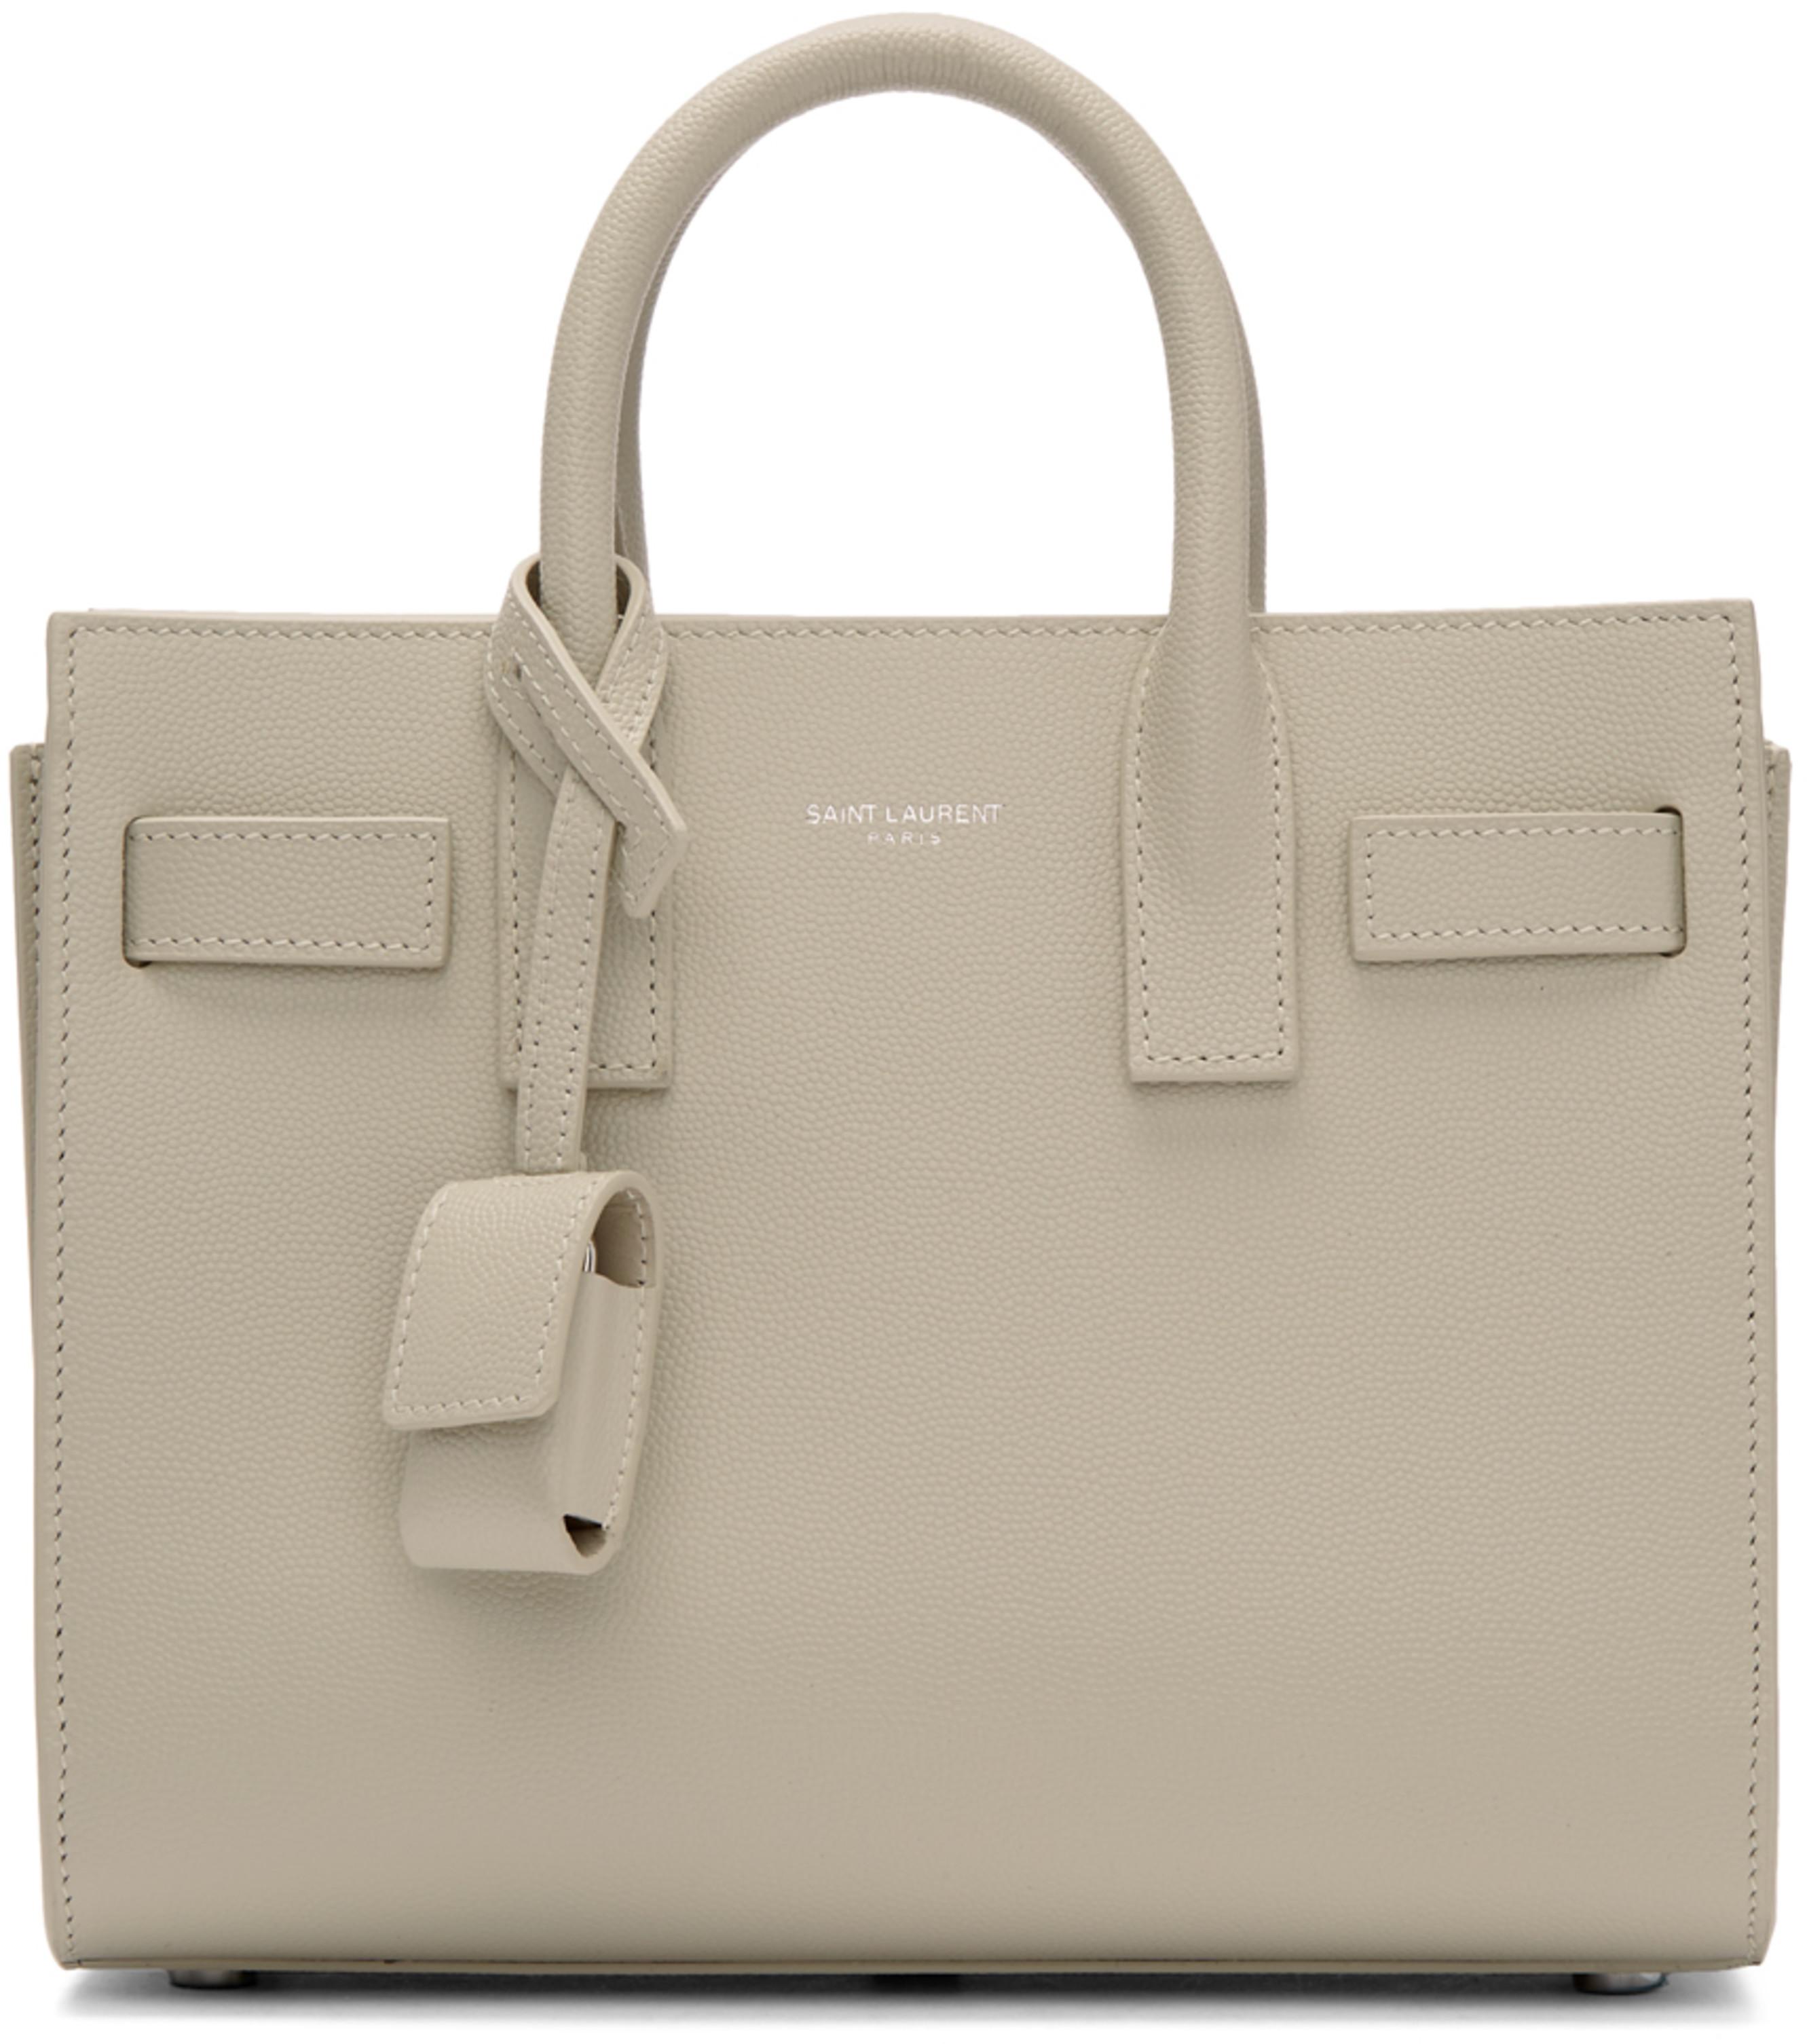 0be86070a62 Saint Laurent bags for Women | SSENSE Canada